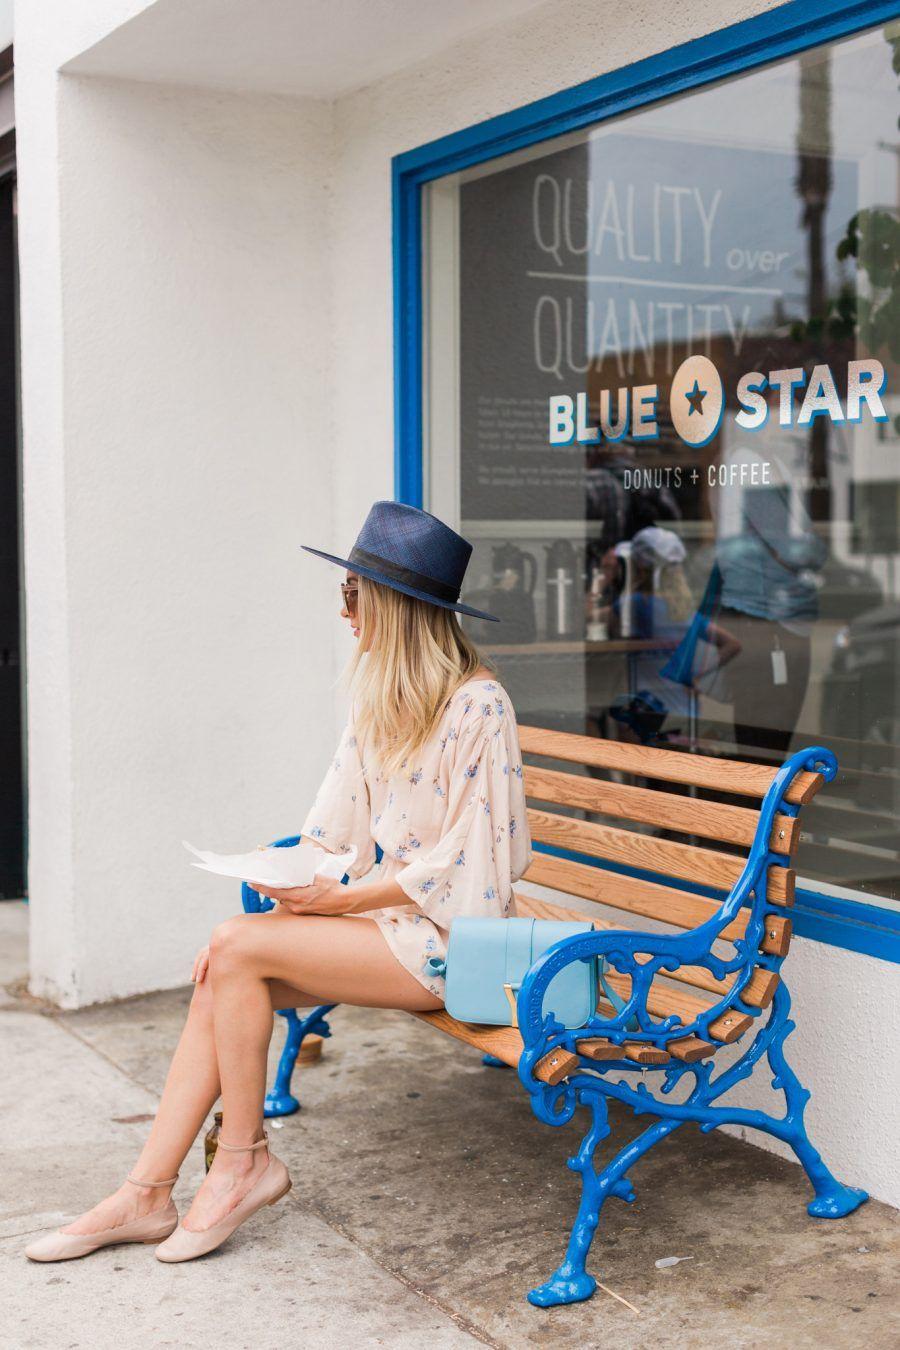 Blue Star AngelFoodStyle waysify